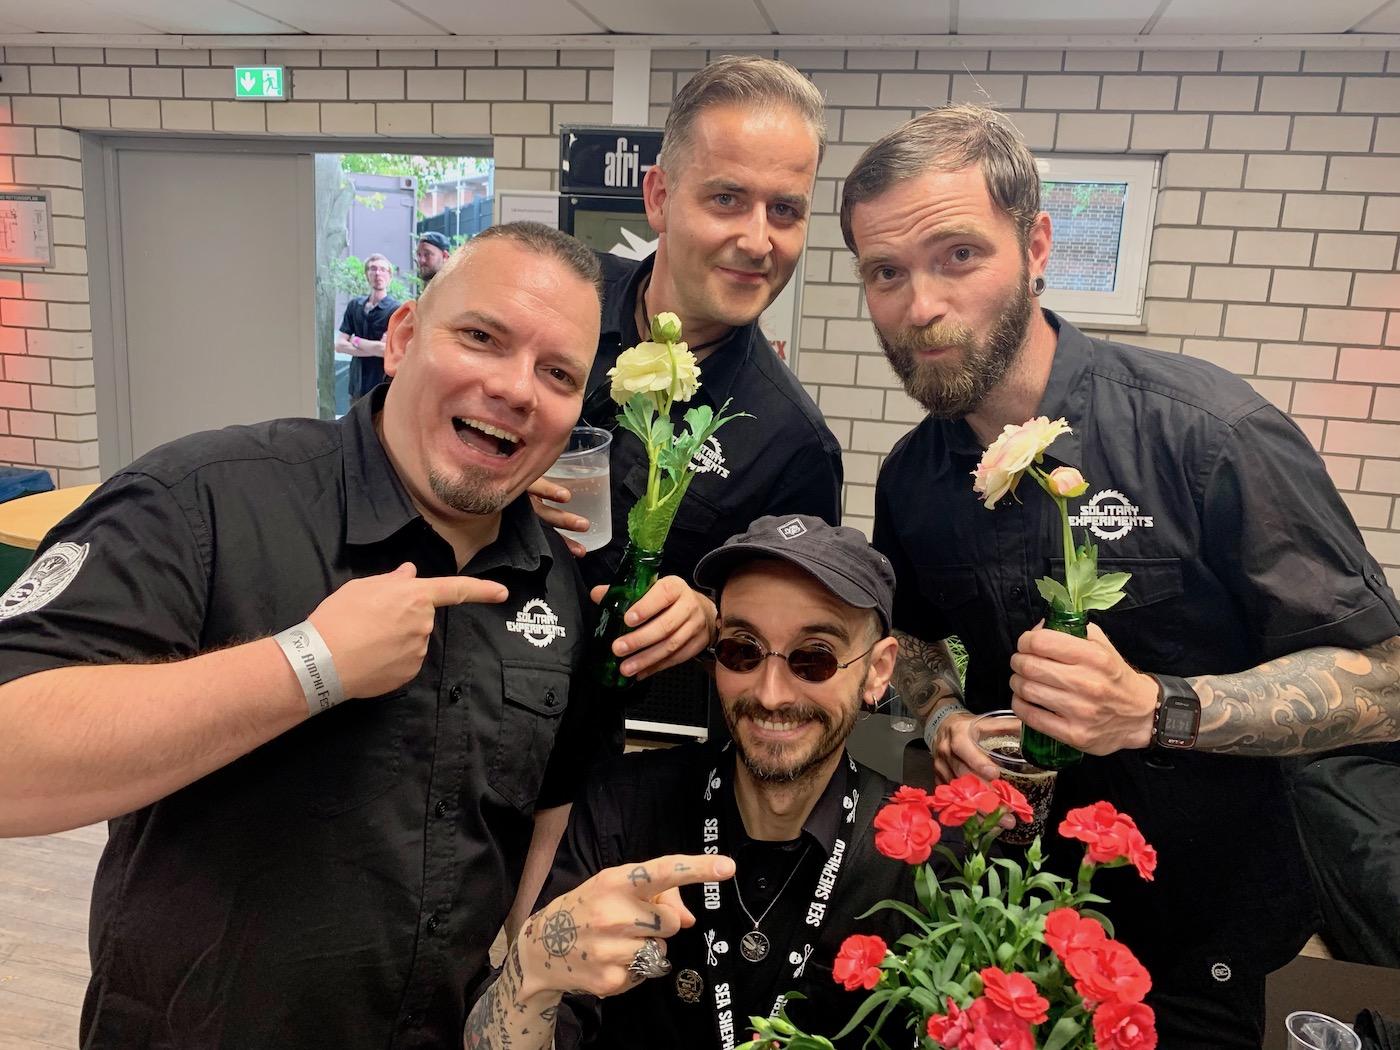 mark_benecke_amphi_festival_koeln_2019 - 29.jpg